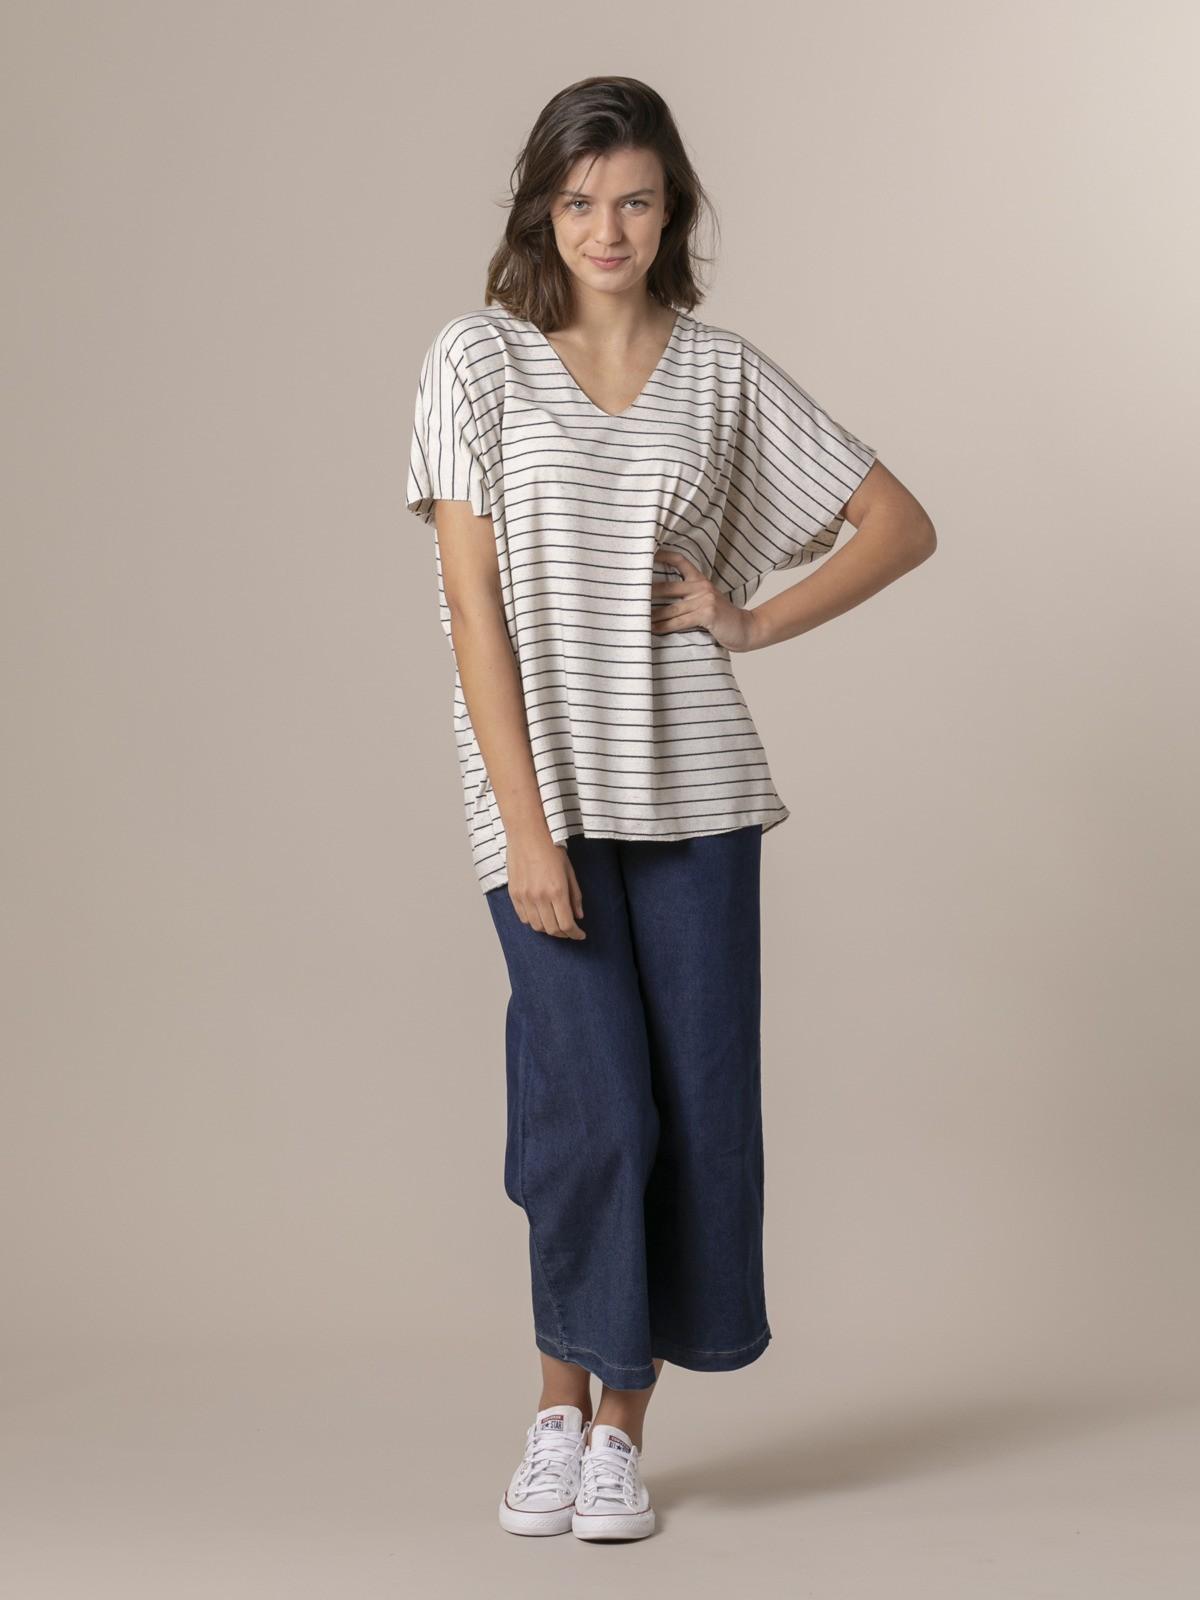 Camiseta mujer oversize rayas Azul